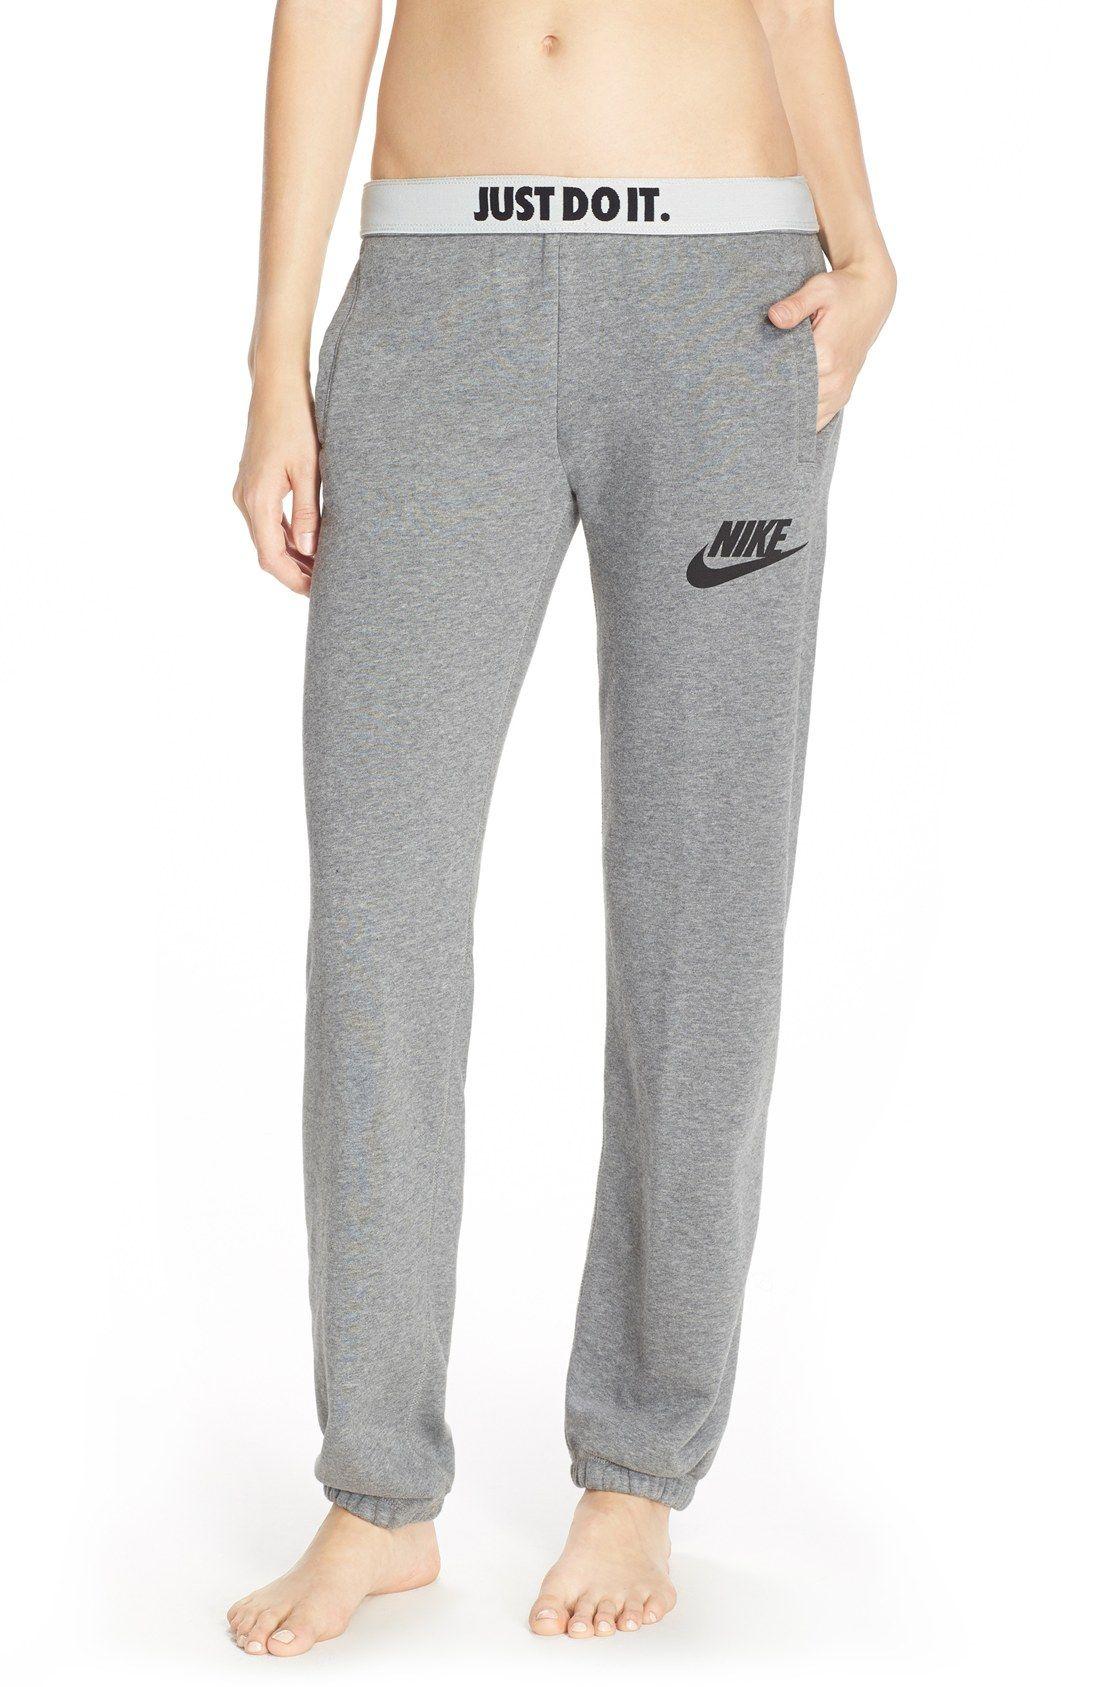 Nike 'Rally' Loose Sweatpants | Sweatpants outfit, Cute